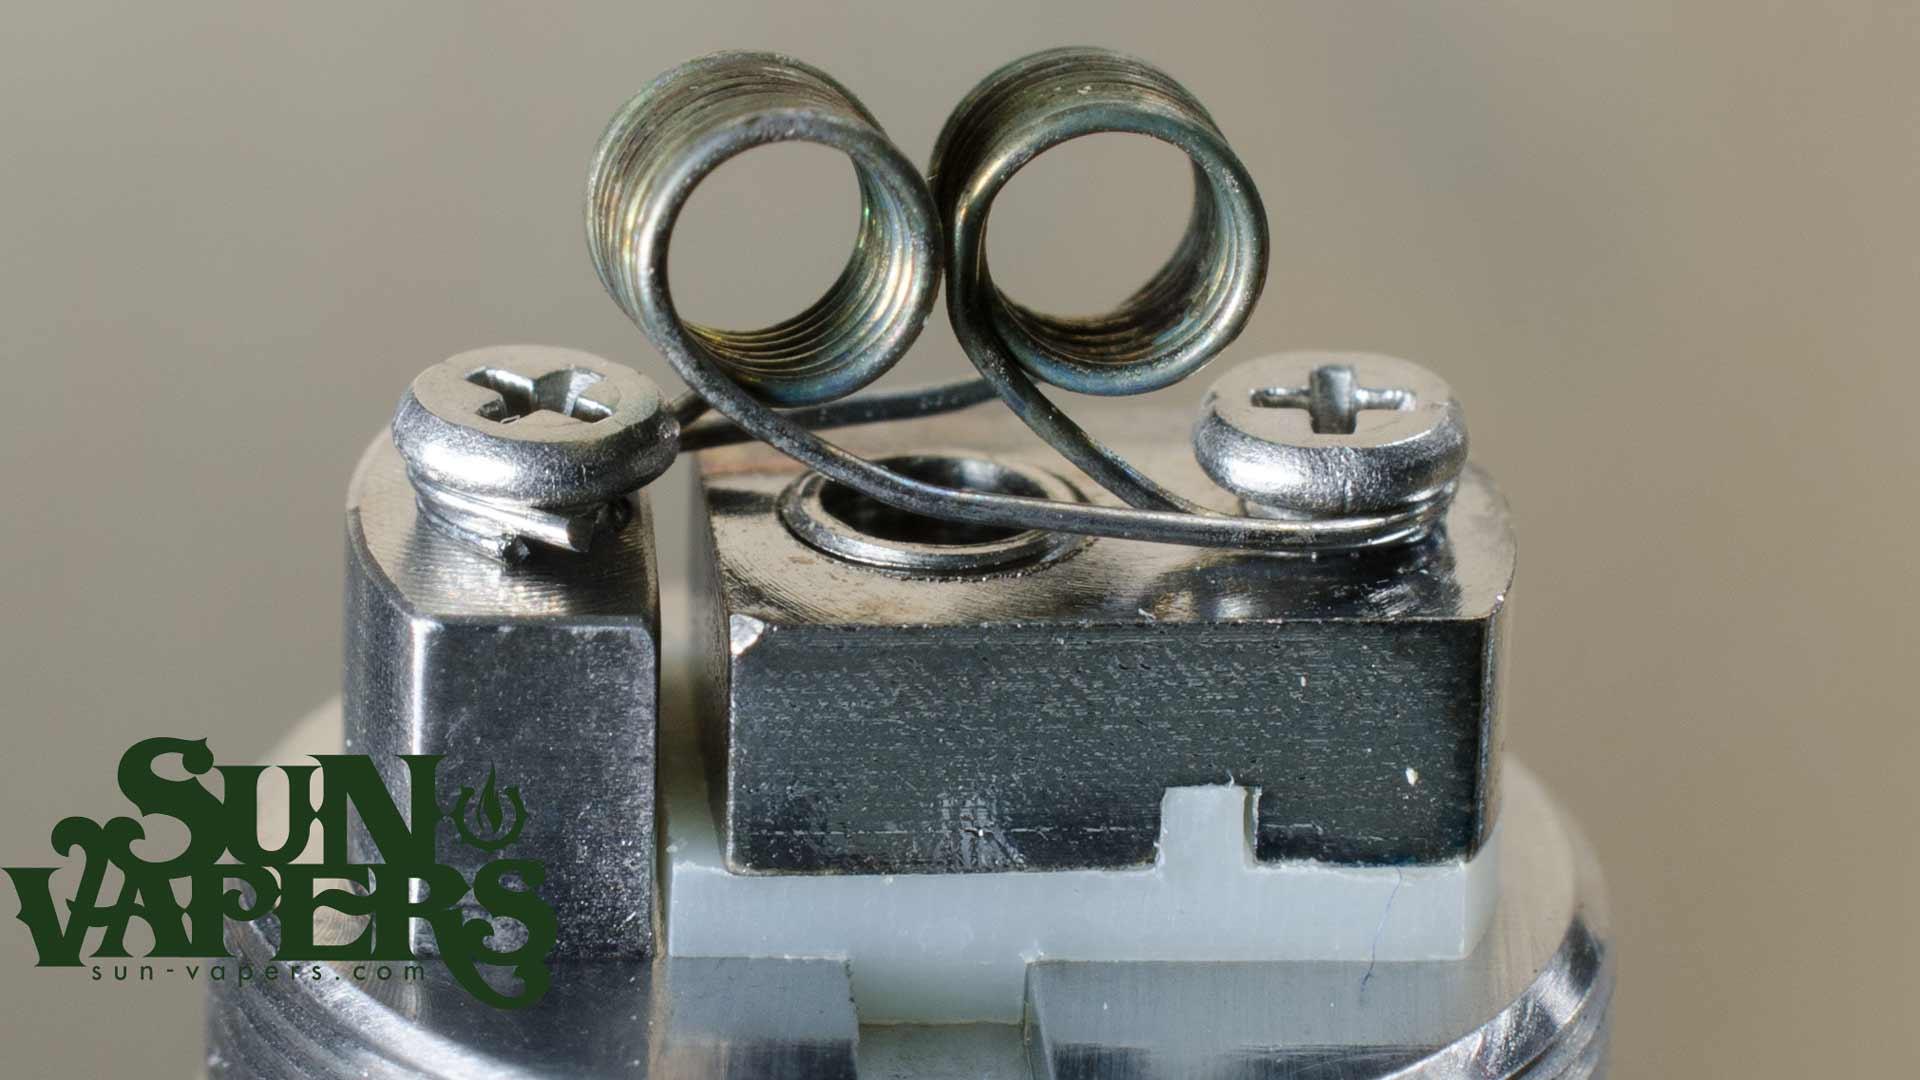 Subtank RDA Deck closeup